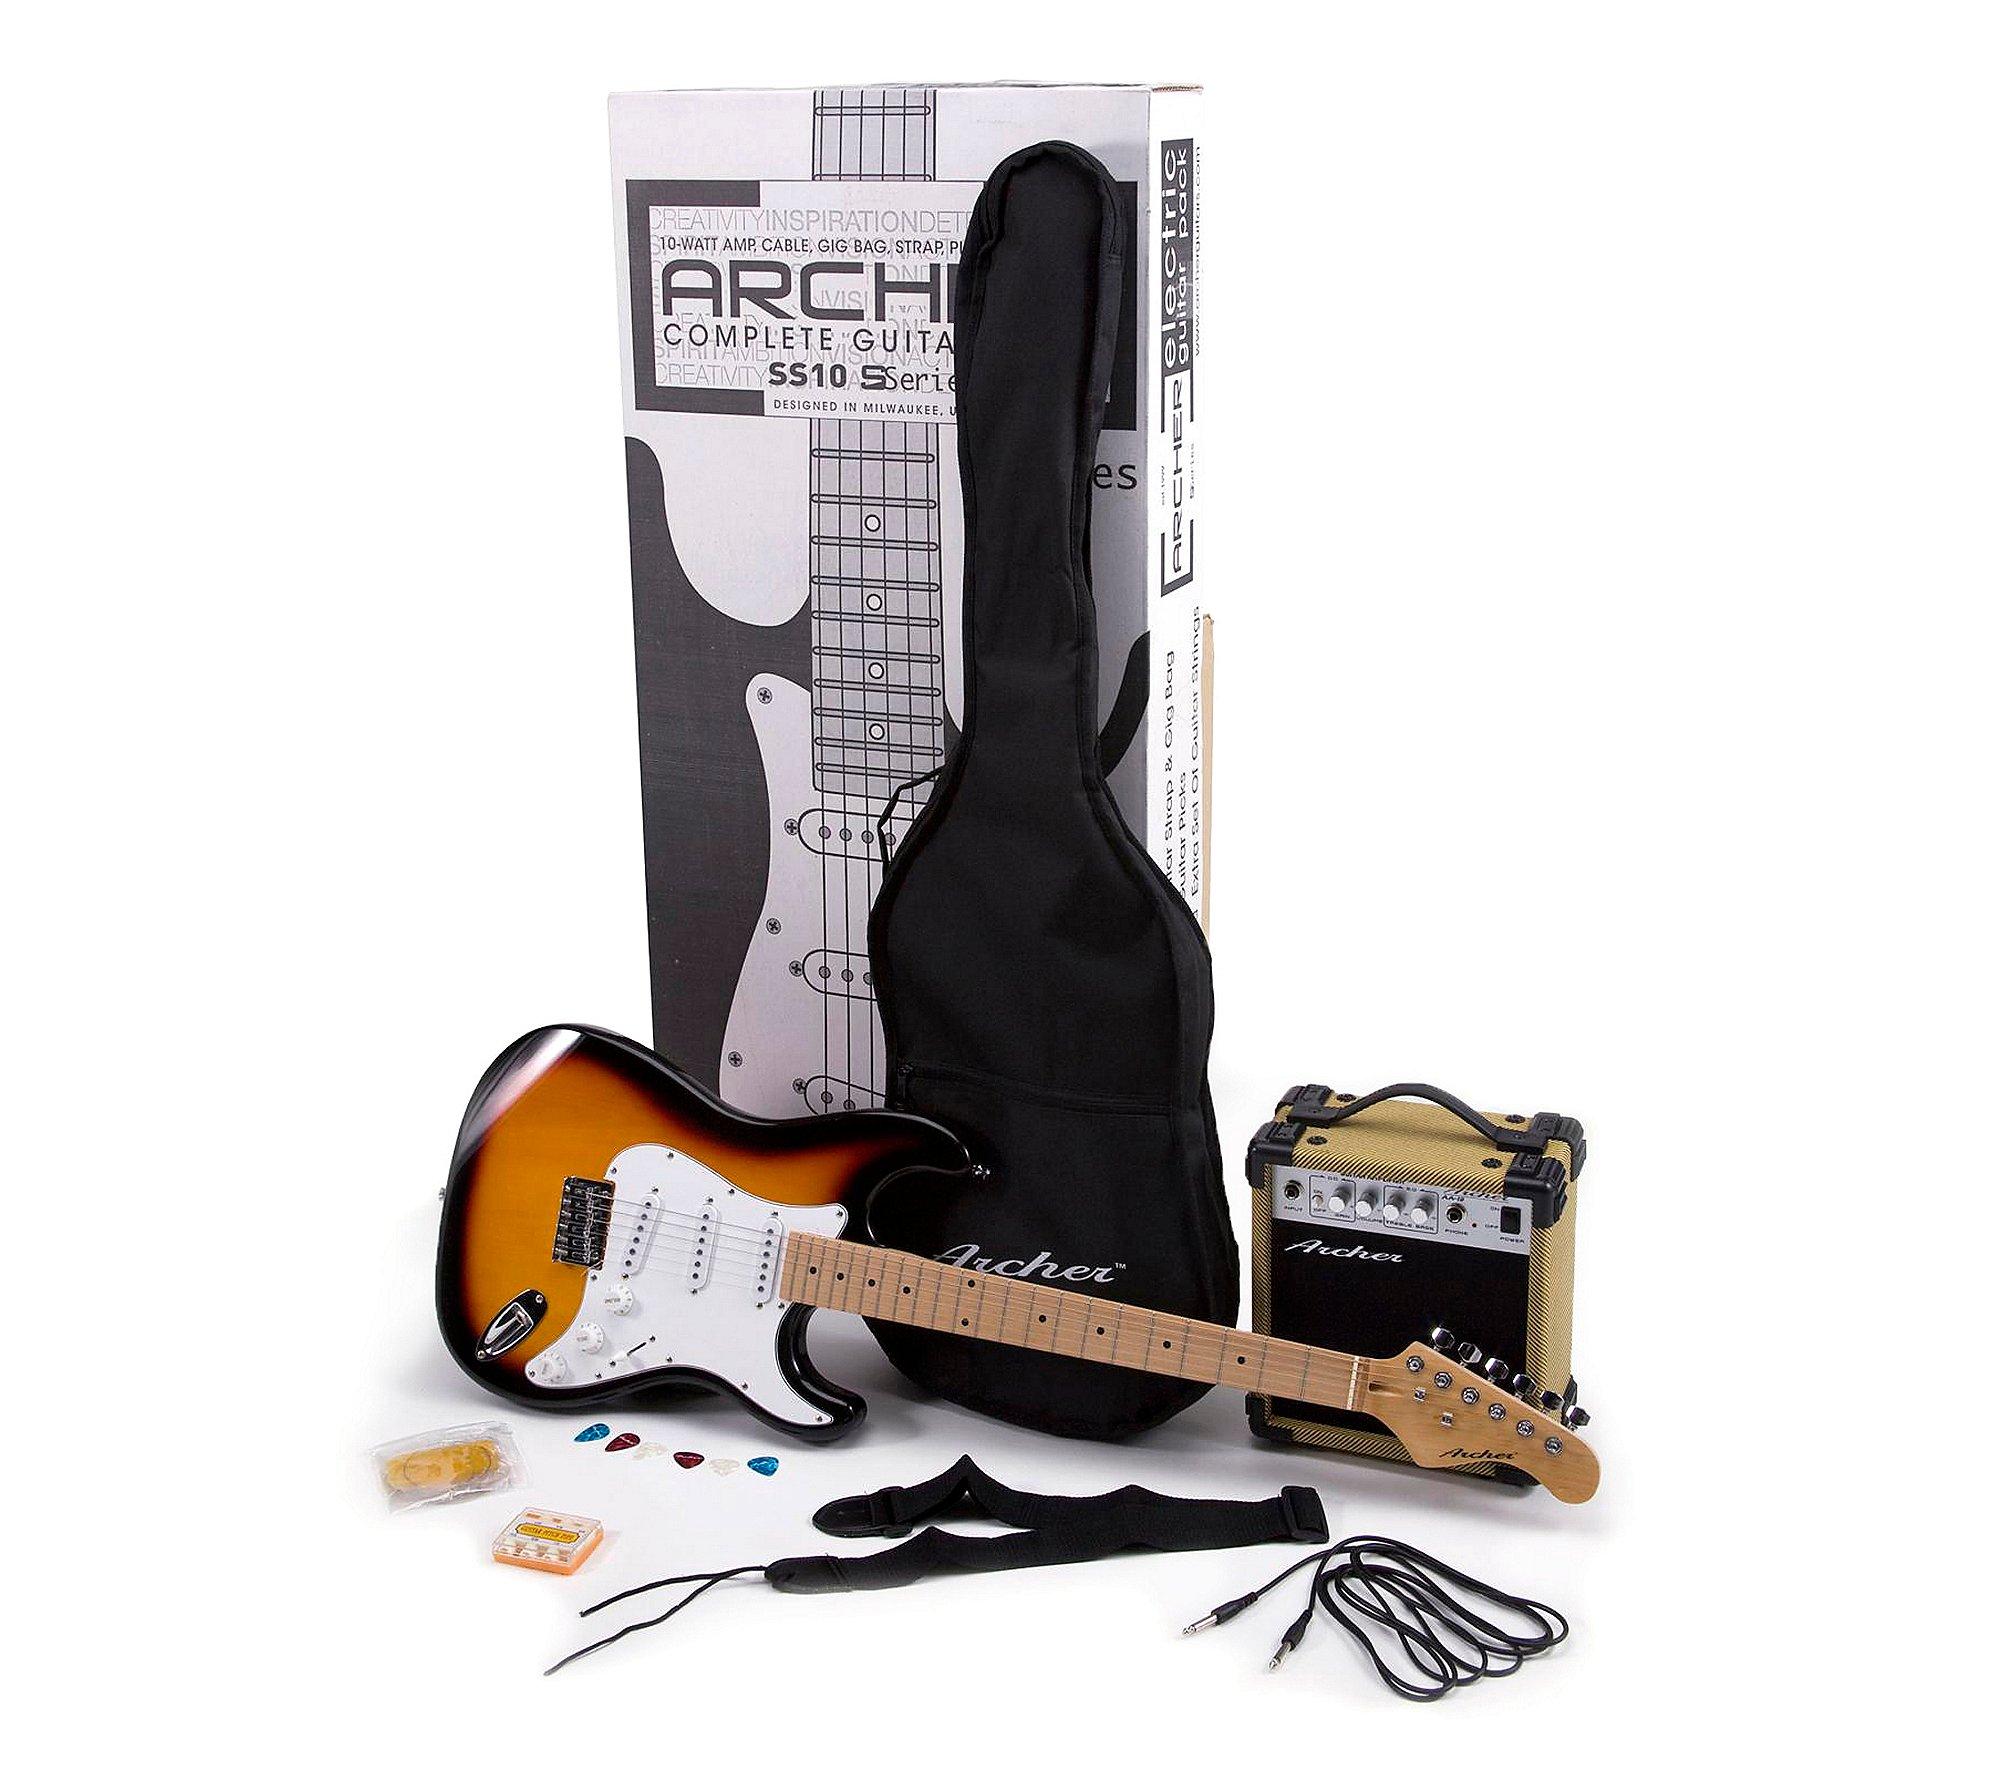 Cheap Archer SS10PAKSB Electric Guitar Package Sunburst Black Friday & Cyber Monday 2019